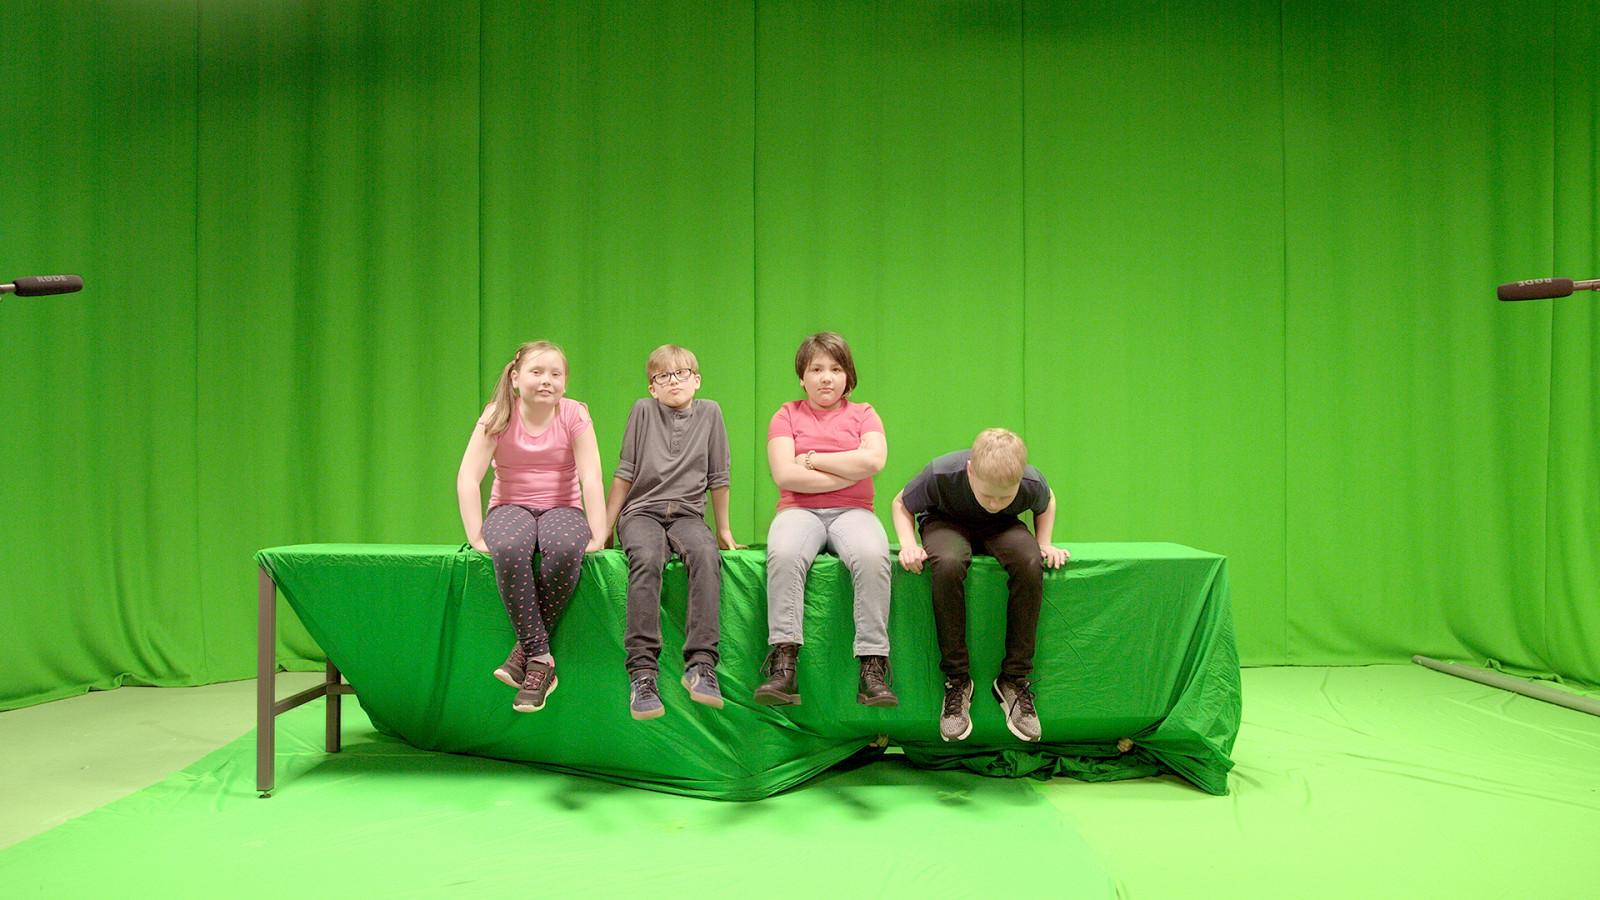 Royal Life Saving Society –image of actors in front of a green screen - Gallery image for Royal Life Saving Society project